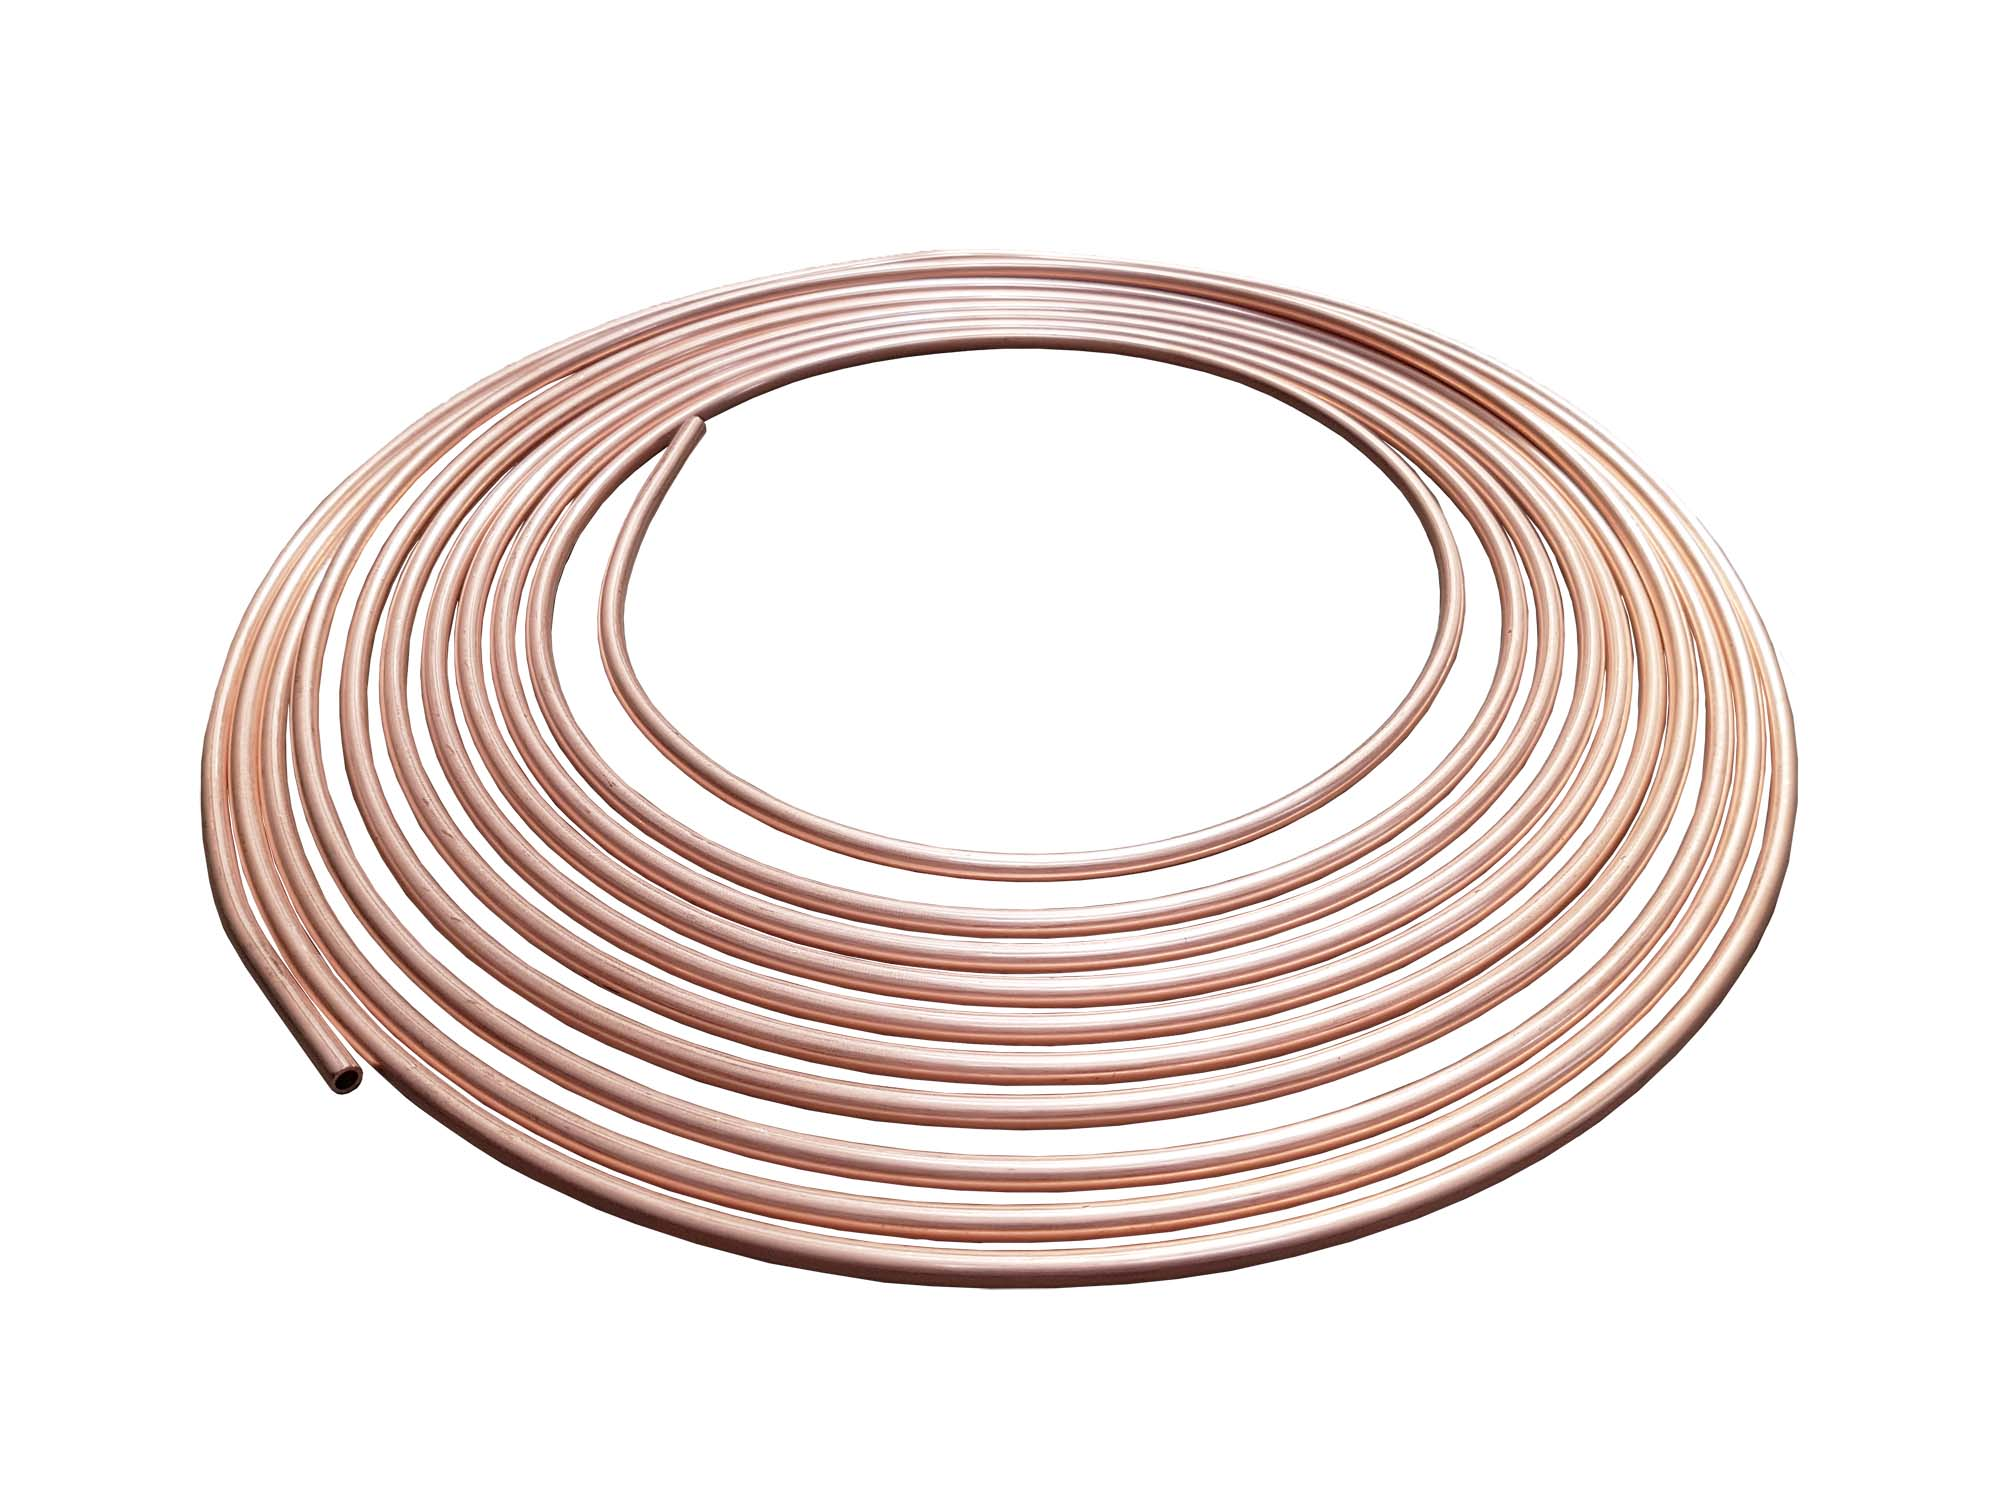 "Copper Brake Pipe 3/16"" x 25ft Long"